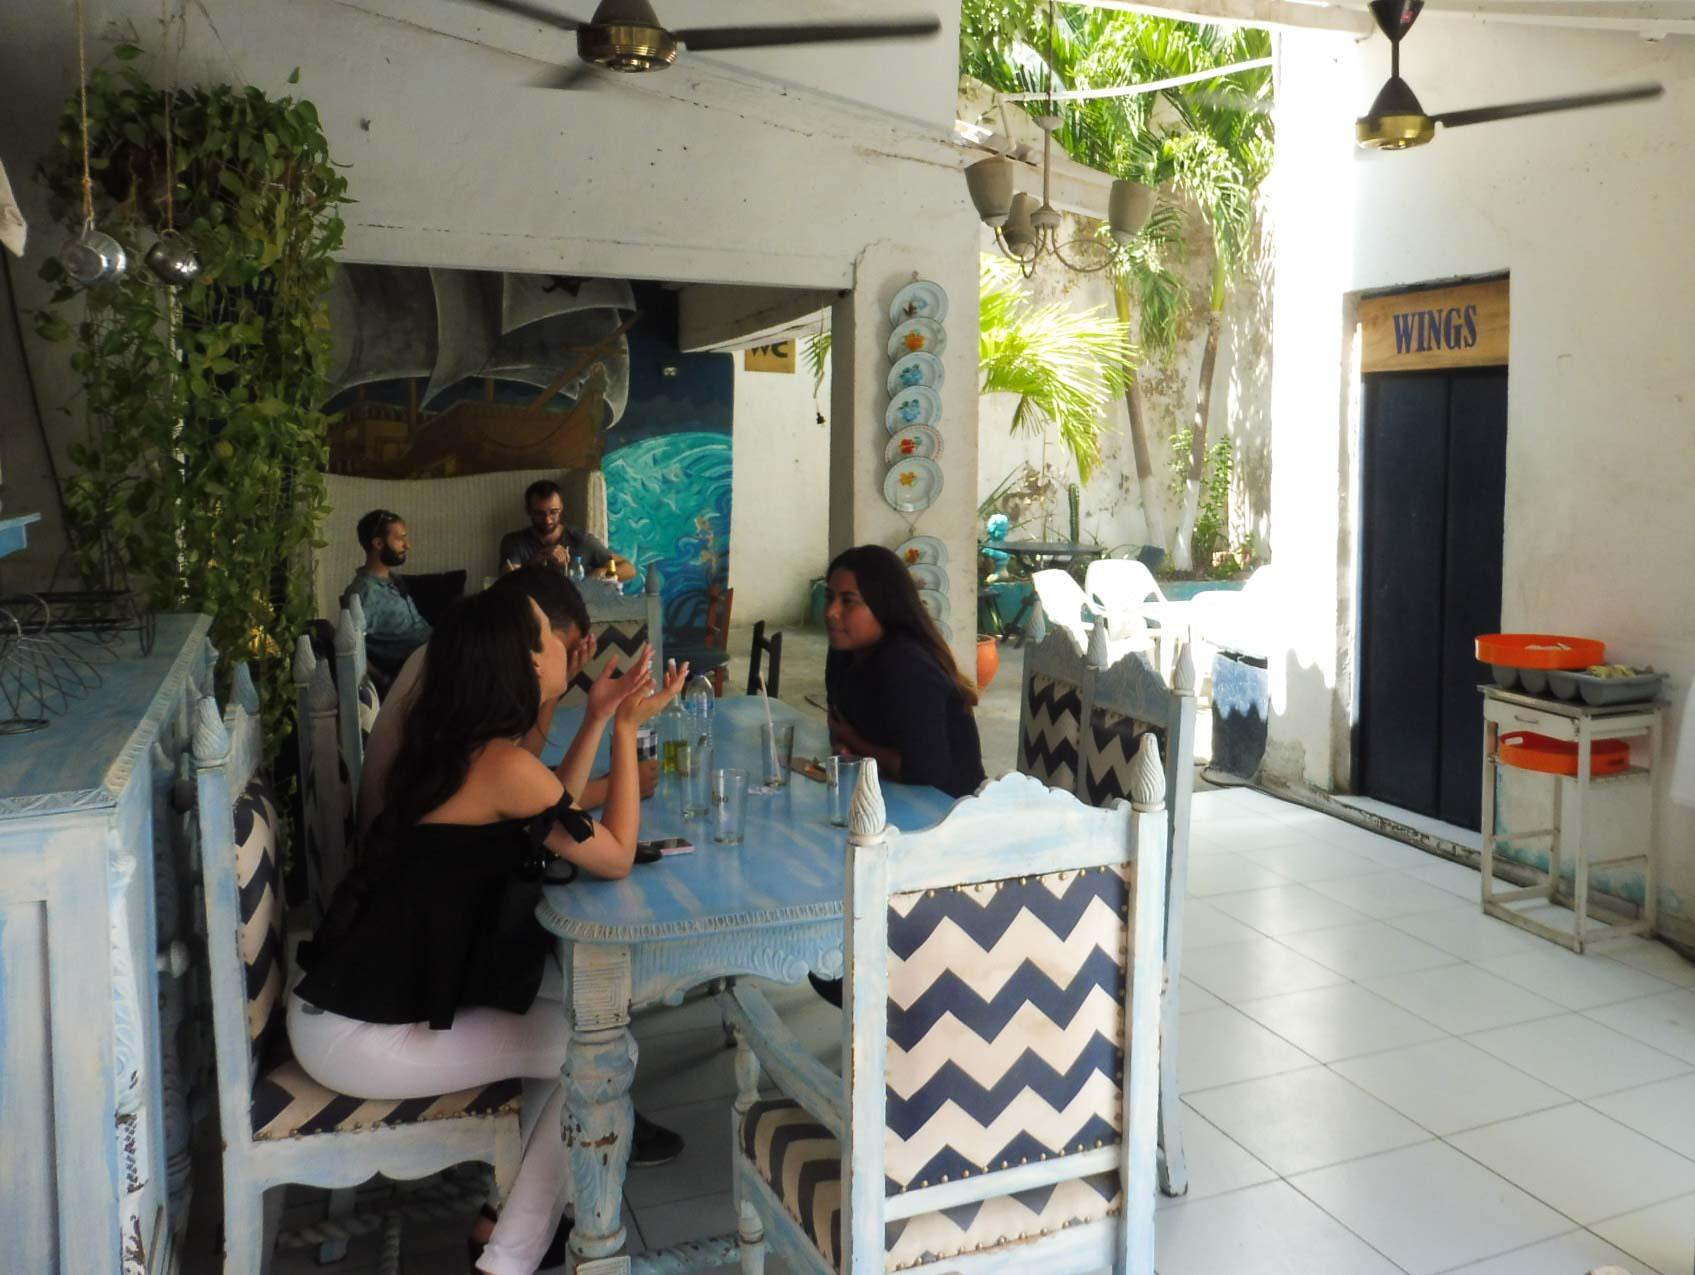 MANGER PAS CHER SANTA MARTA - Restaurant Caribbean Wings